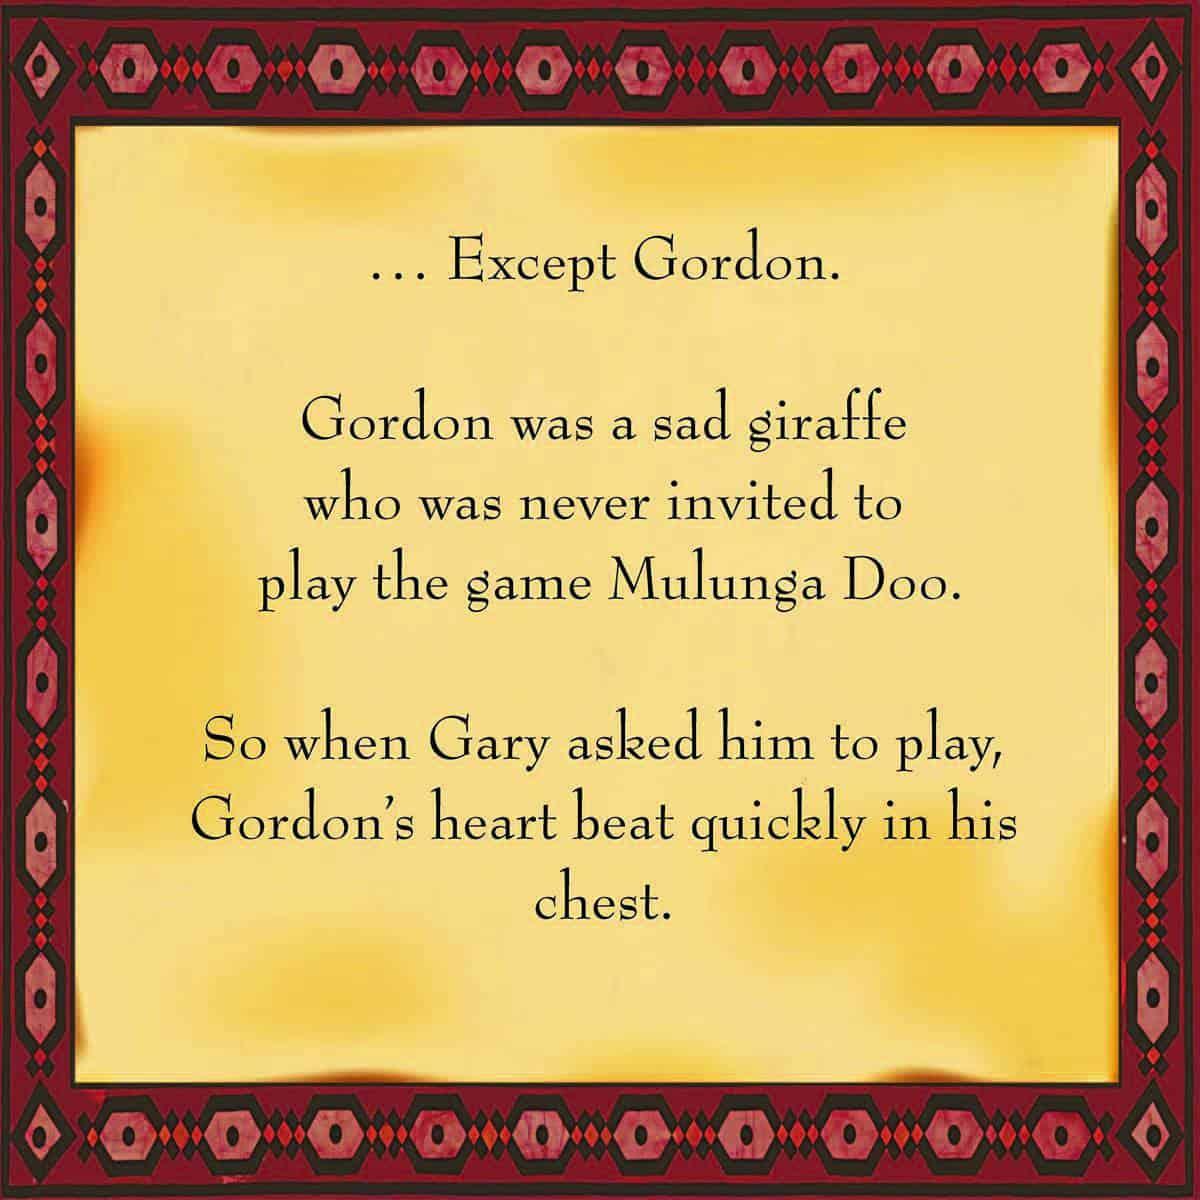 Gordon-the-Giraffe-image-05